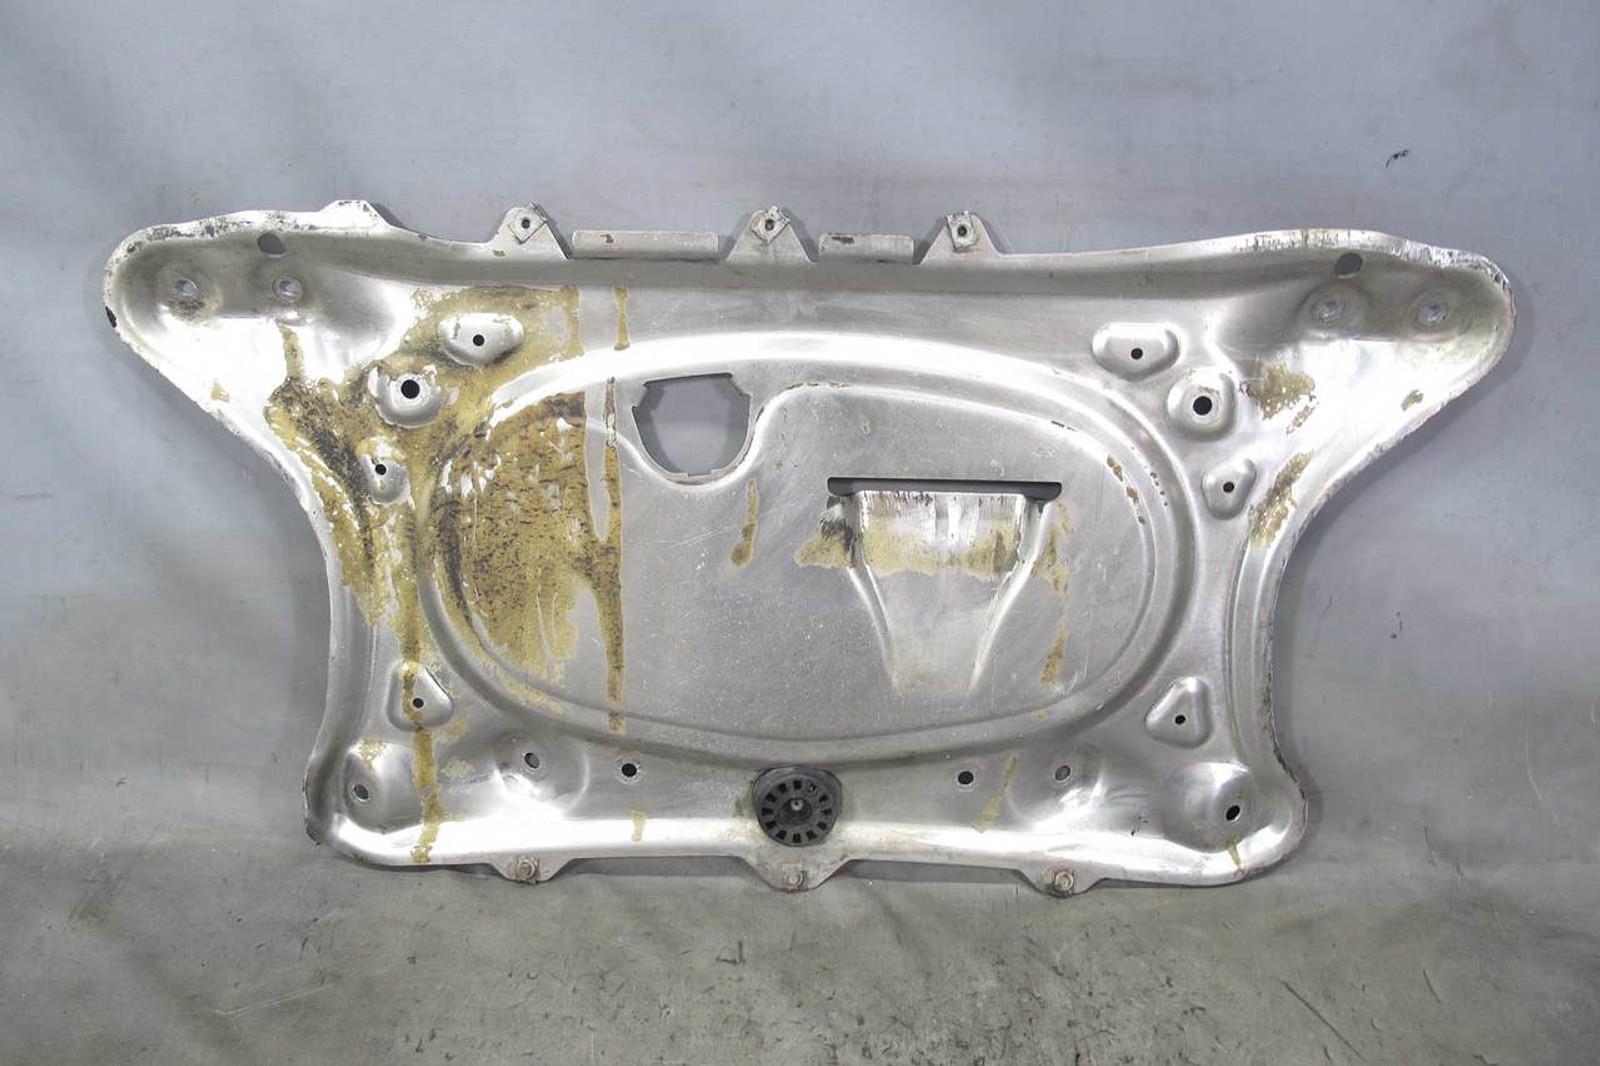 2001-2008 BMW E46 M3 Z4 M Engine Belly Metal Pan Reinforcement Skid Plate w  Bend - 21912